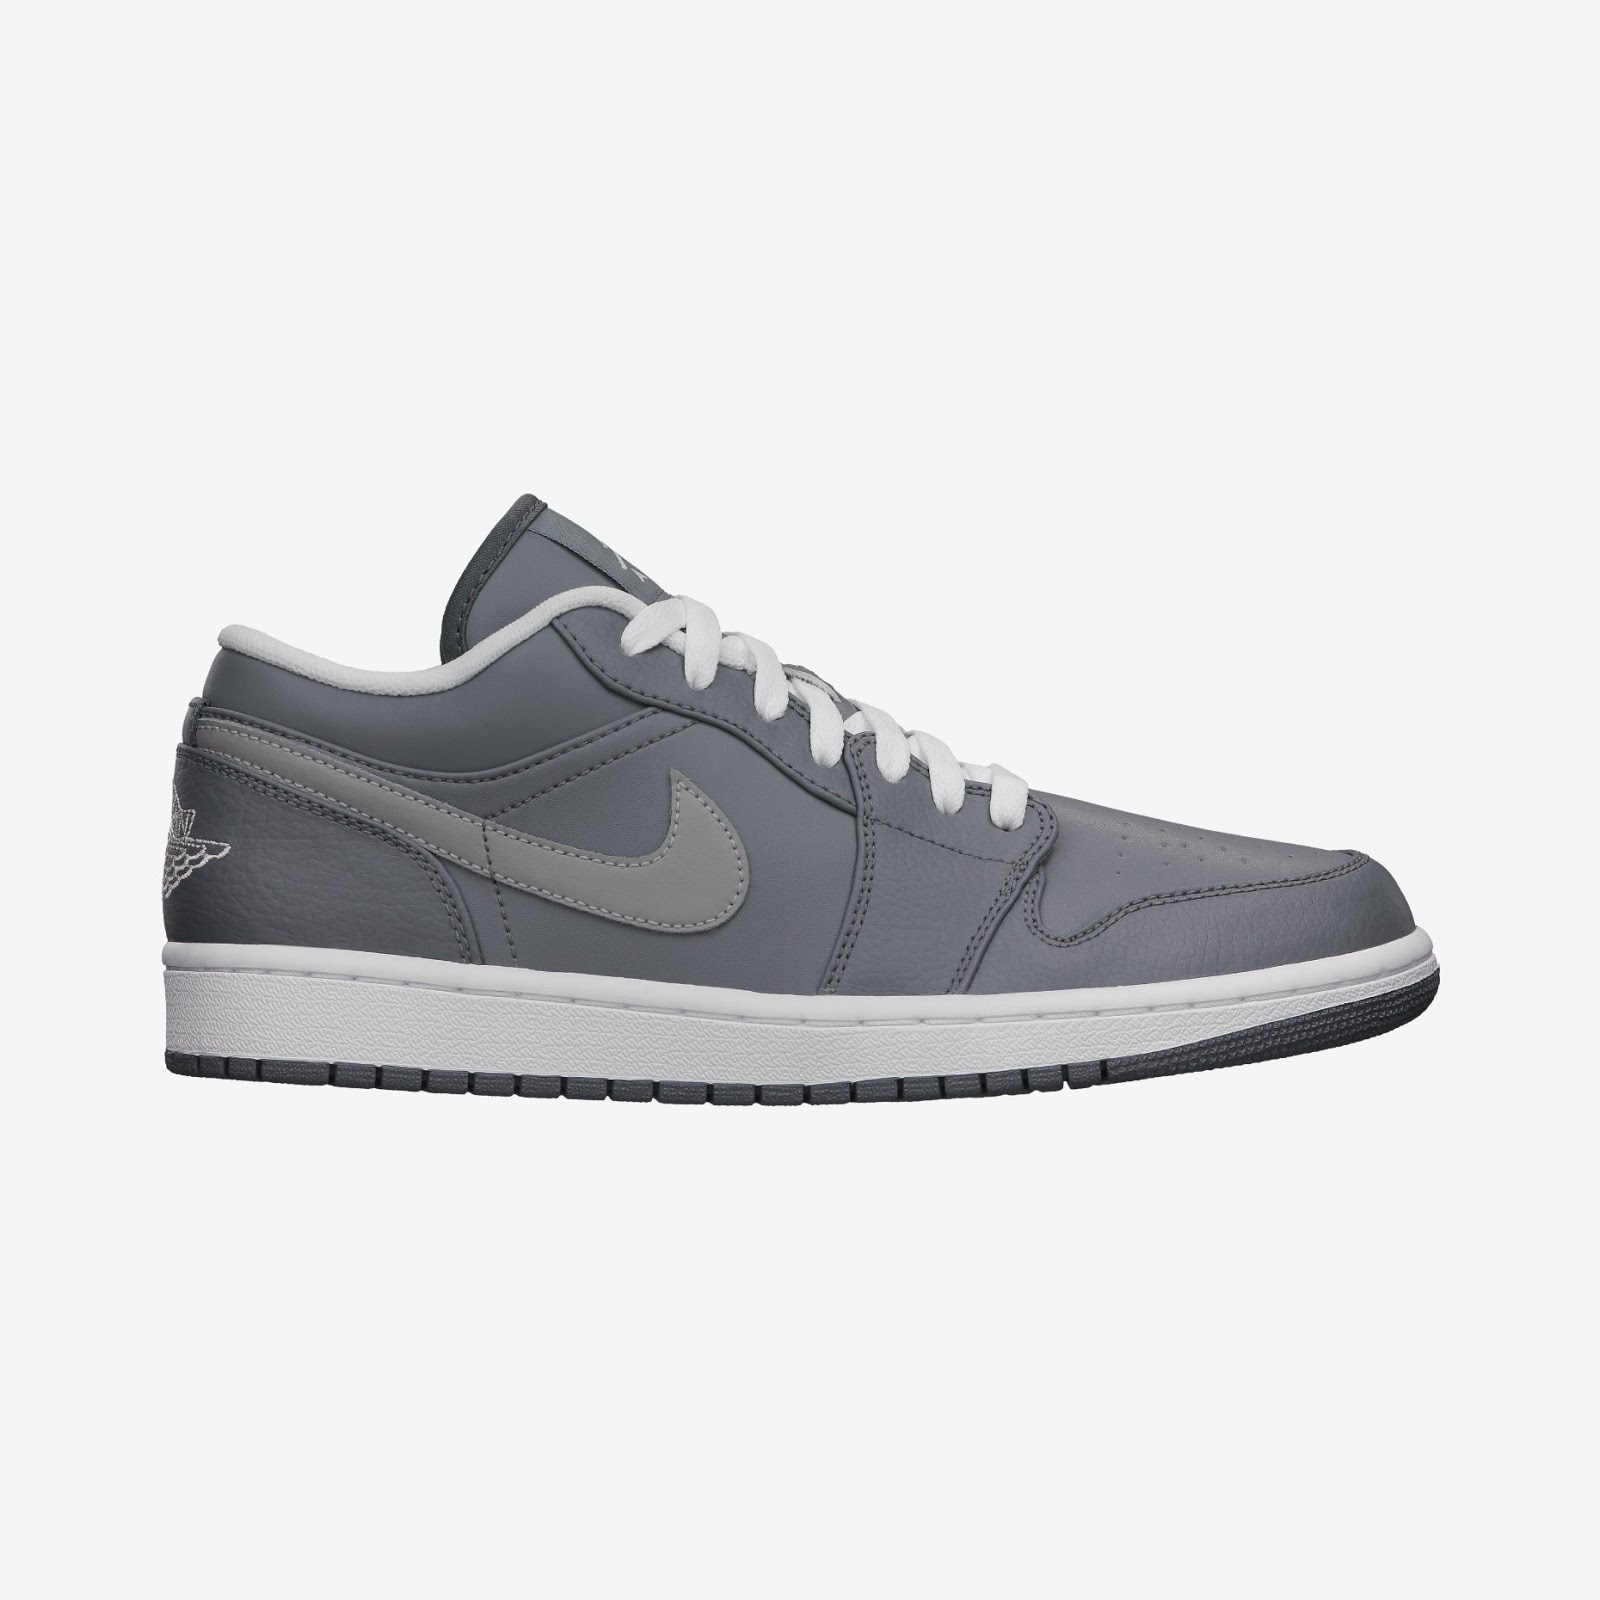 6ceb066aab07 Nike Air Jordan Retro Basketball Shoes and Sandals!  AIR JORDAN 1 ...